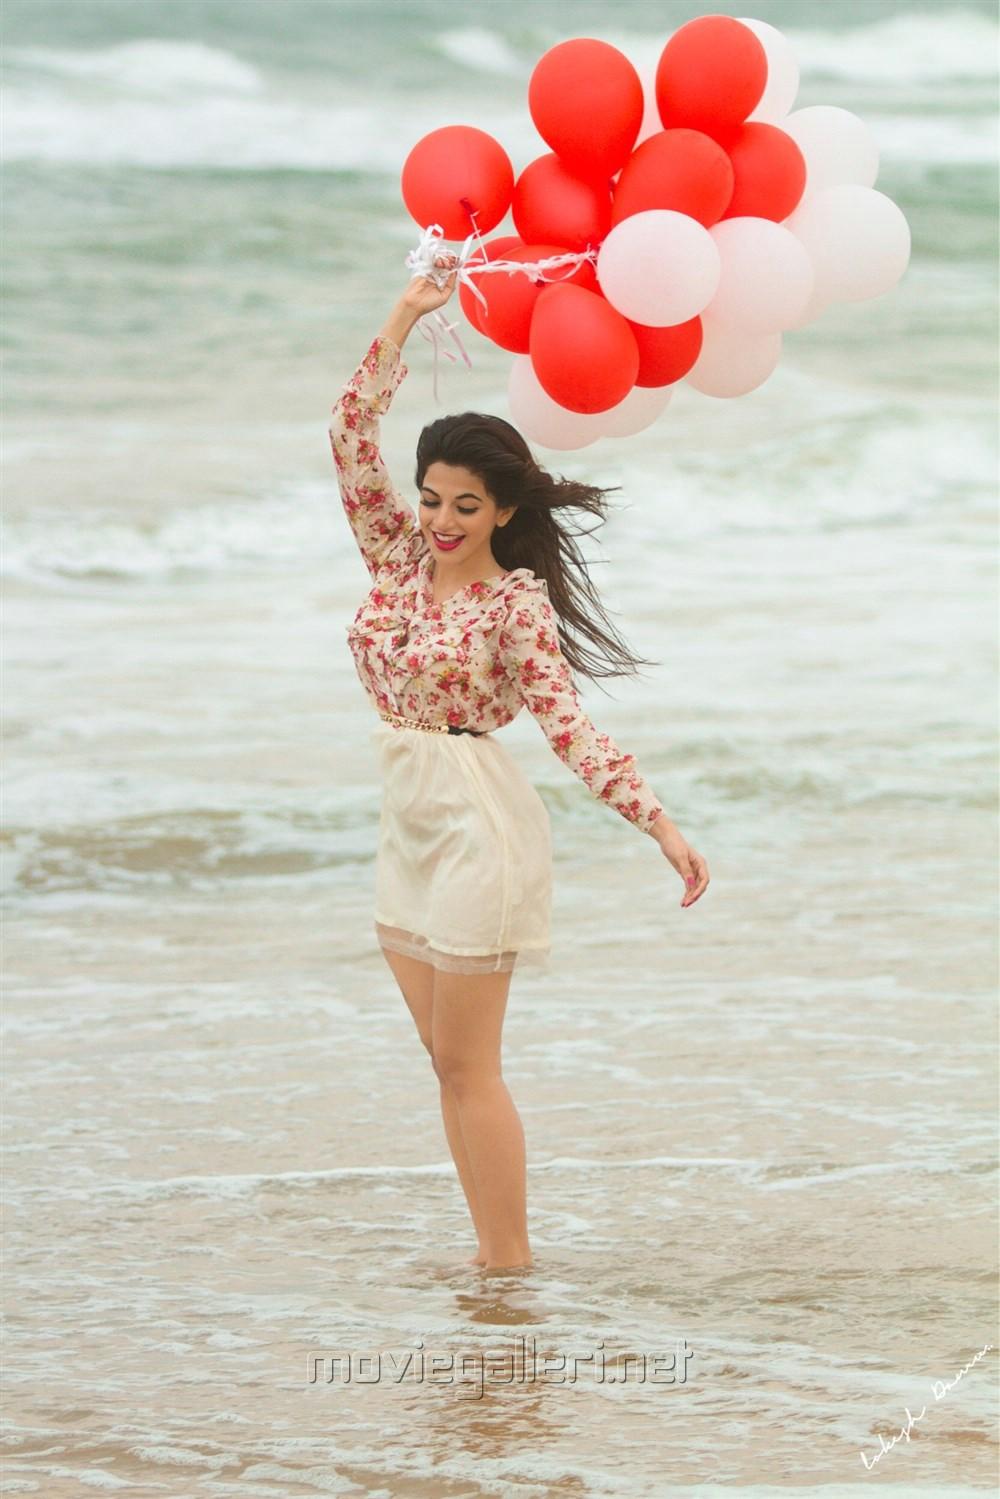 Tamil Actress Iswarya Menon New Hot Portfolio Pictures